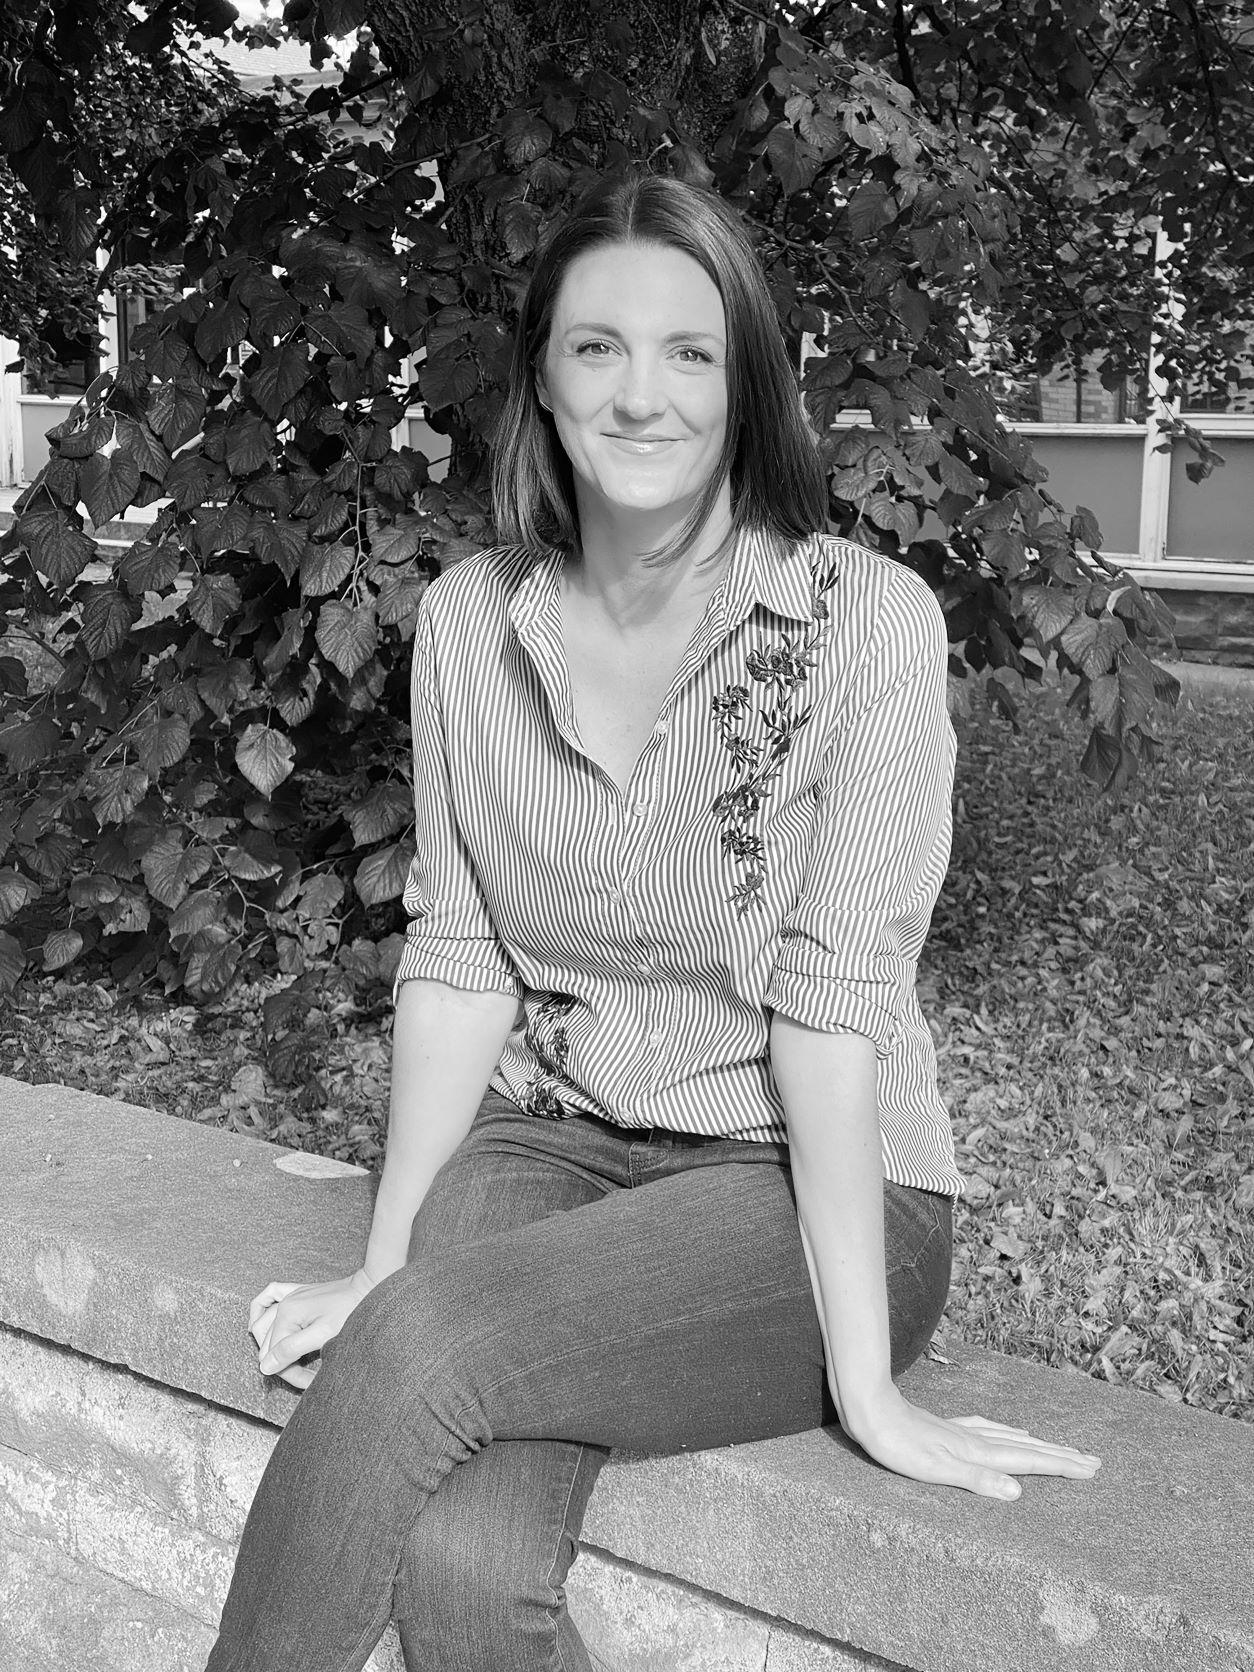 Image of Karen Wyatt sitting on a wall